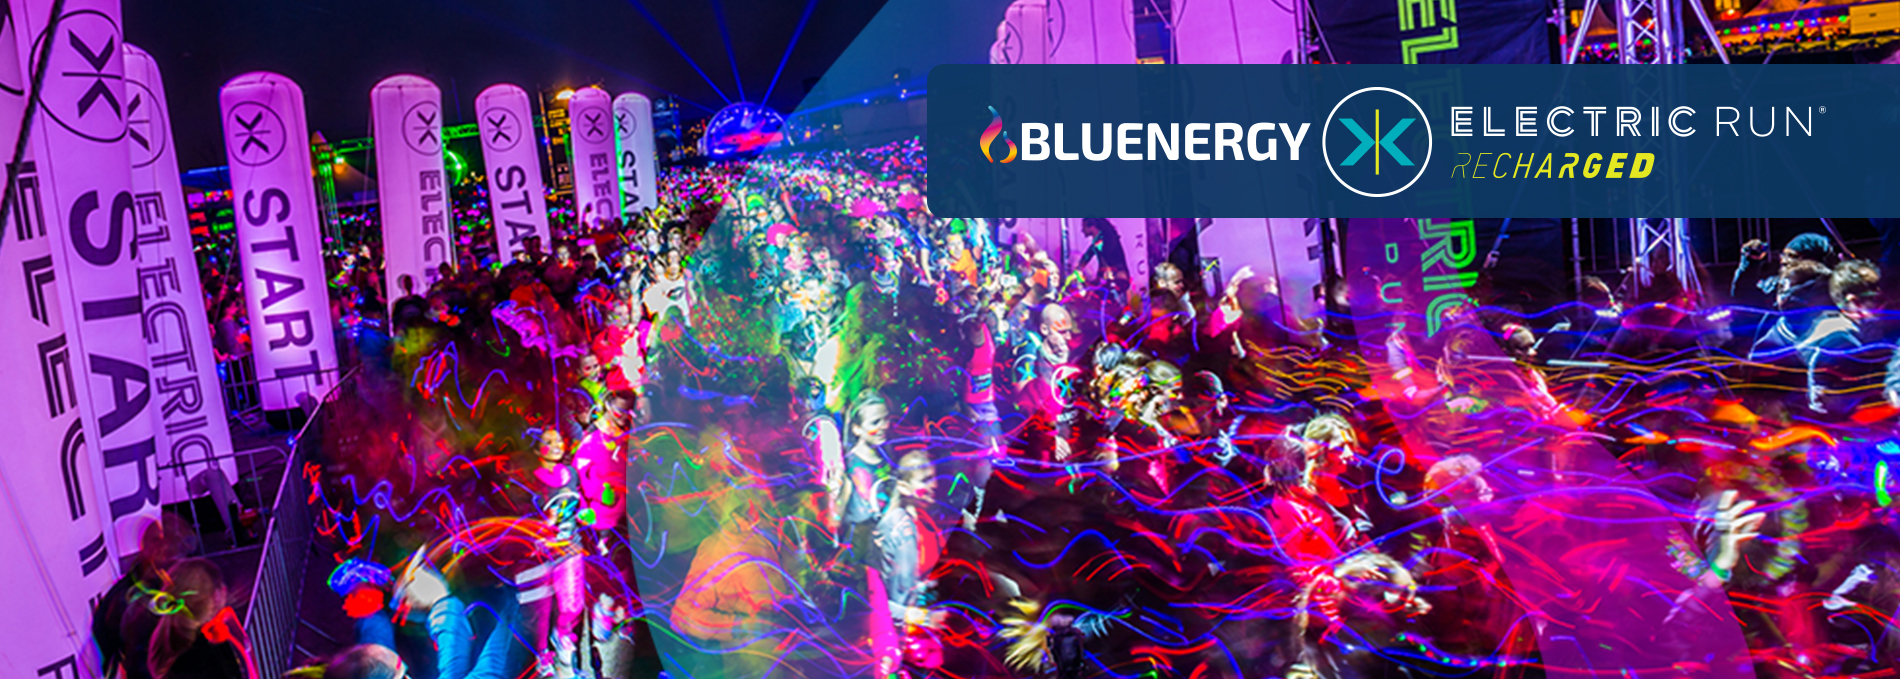 Bluenergy Electric Run